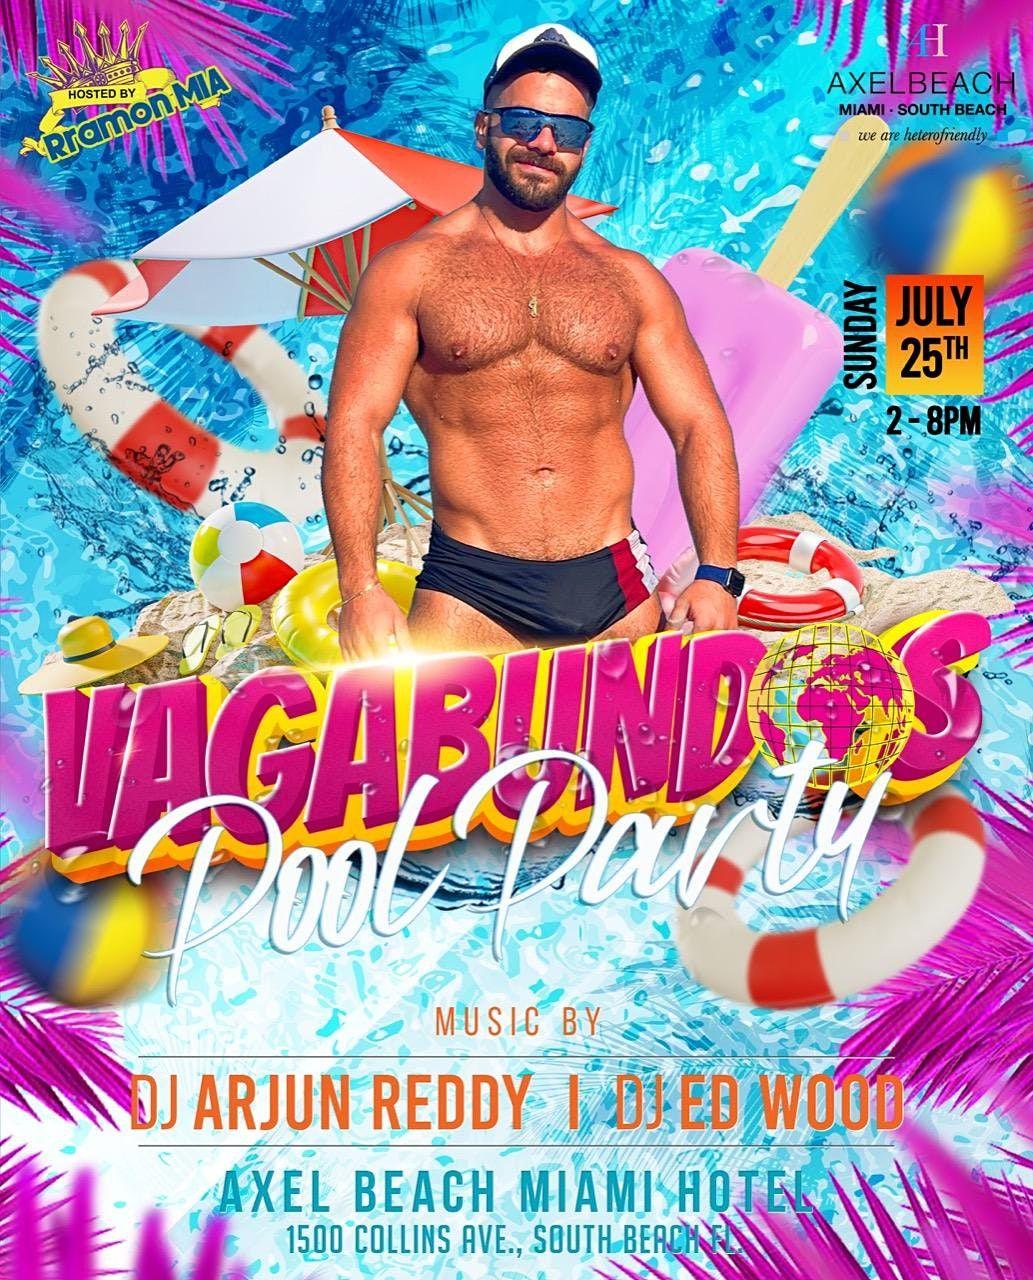 Vagabundos Pool Party